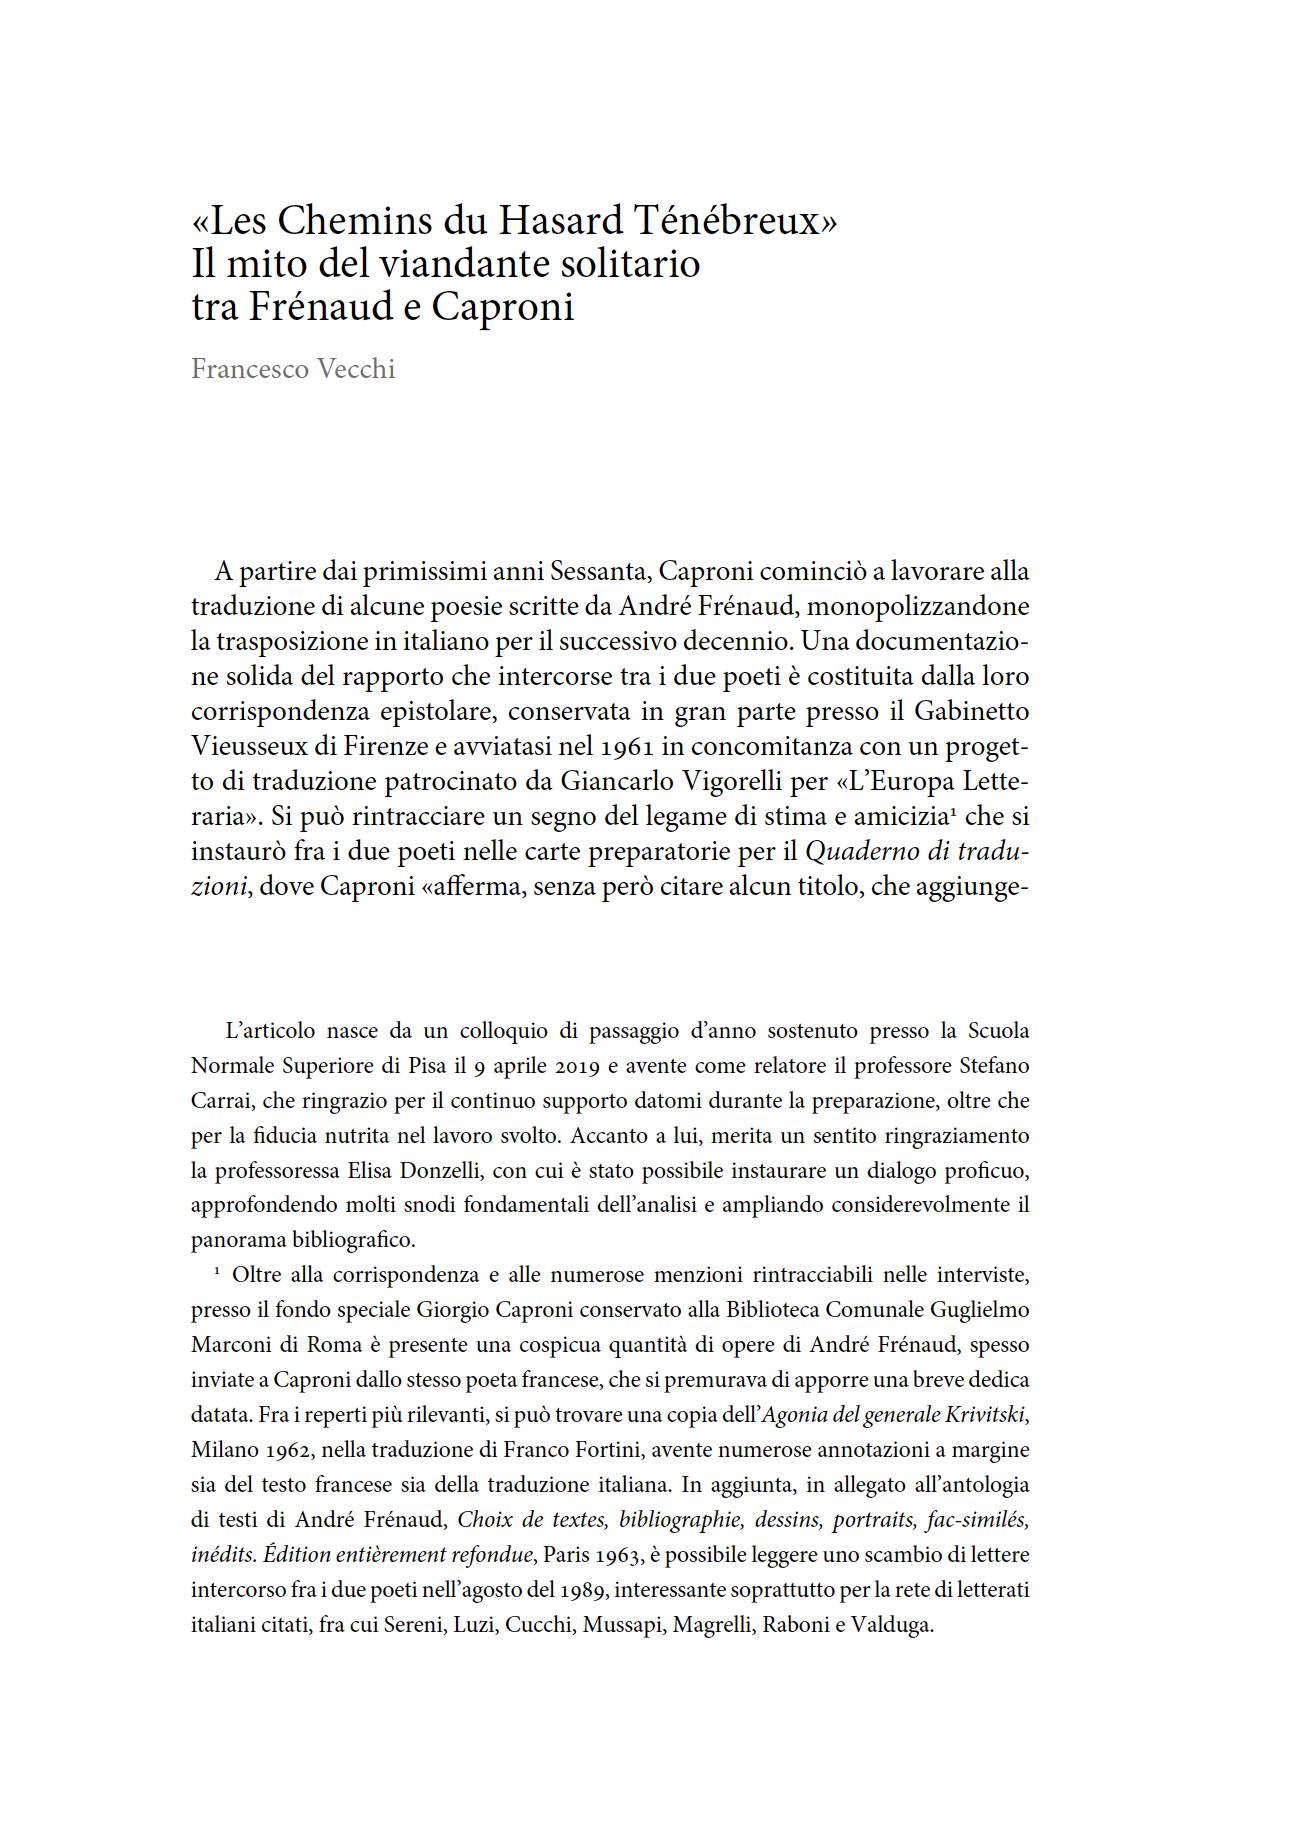 «Les Chemins du Hasard Ténébreux». Il mito del viandante solitario tra Frénaud e Caproni